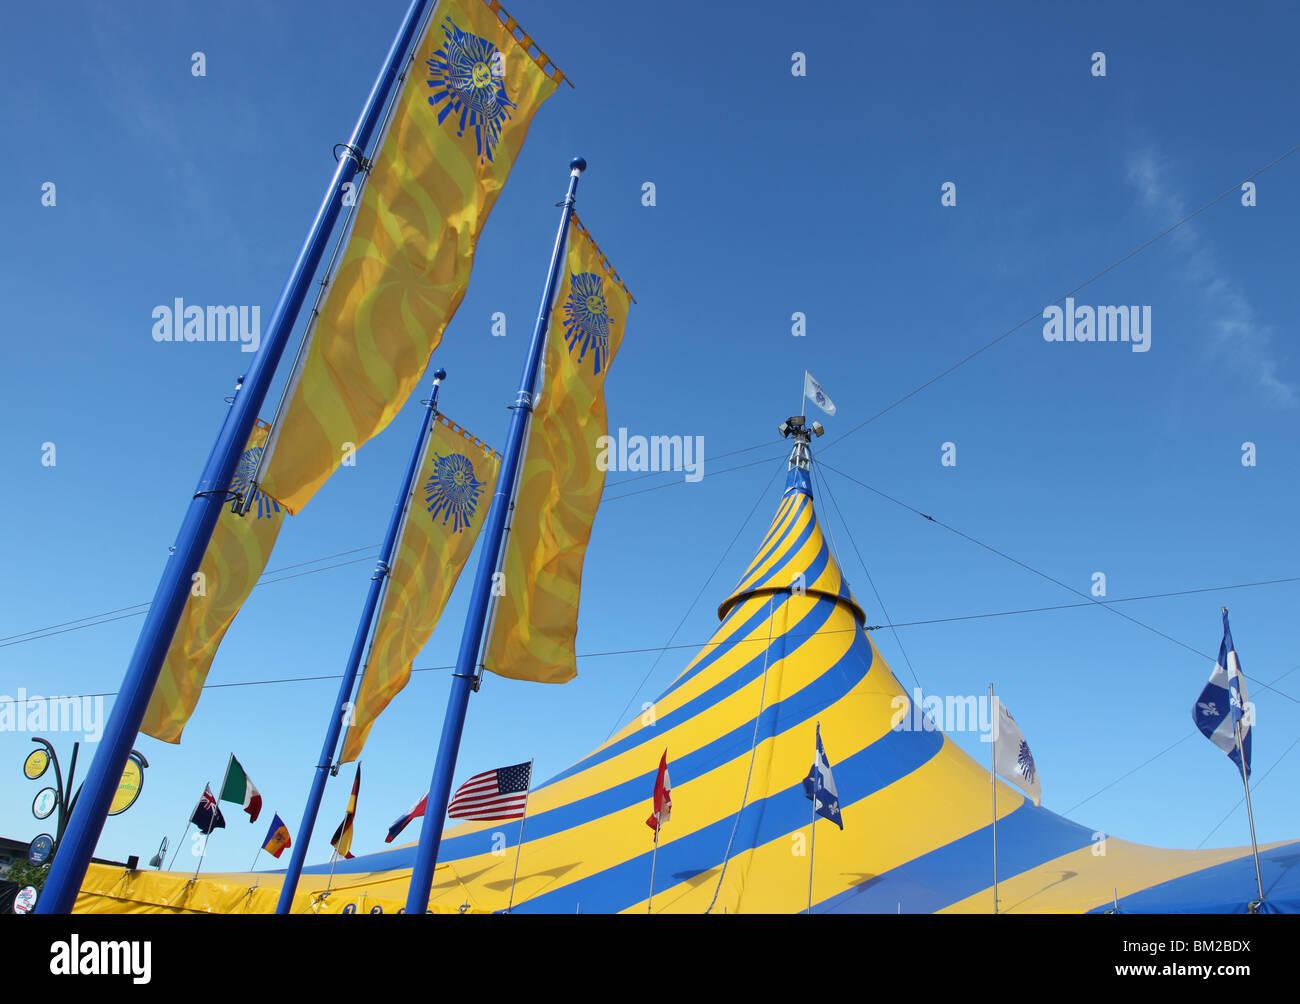 Cirque du Soleil tent & Cirque du Soleil tent Stock Photo: 29556406 - Alamy